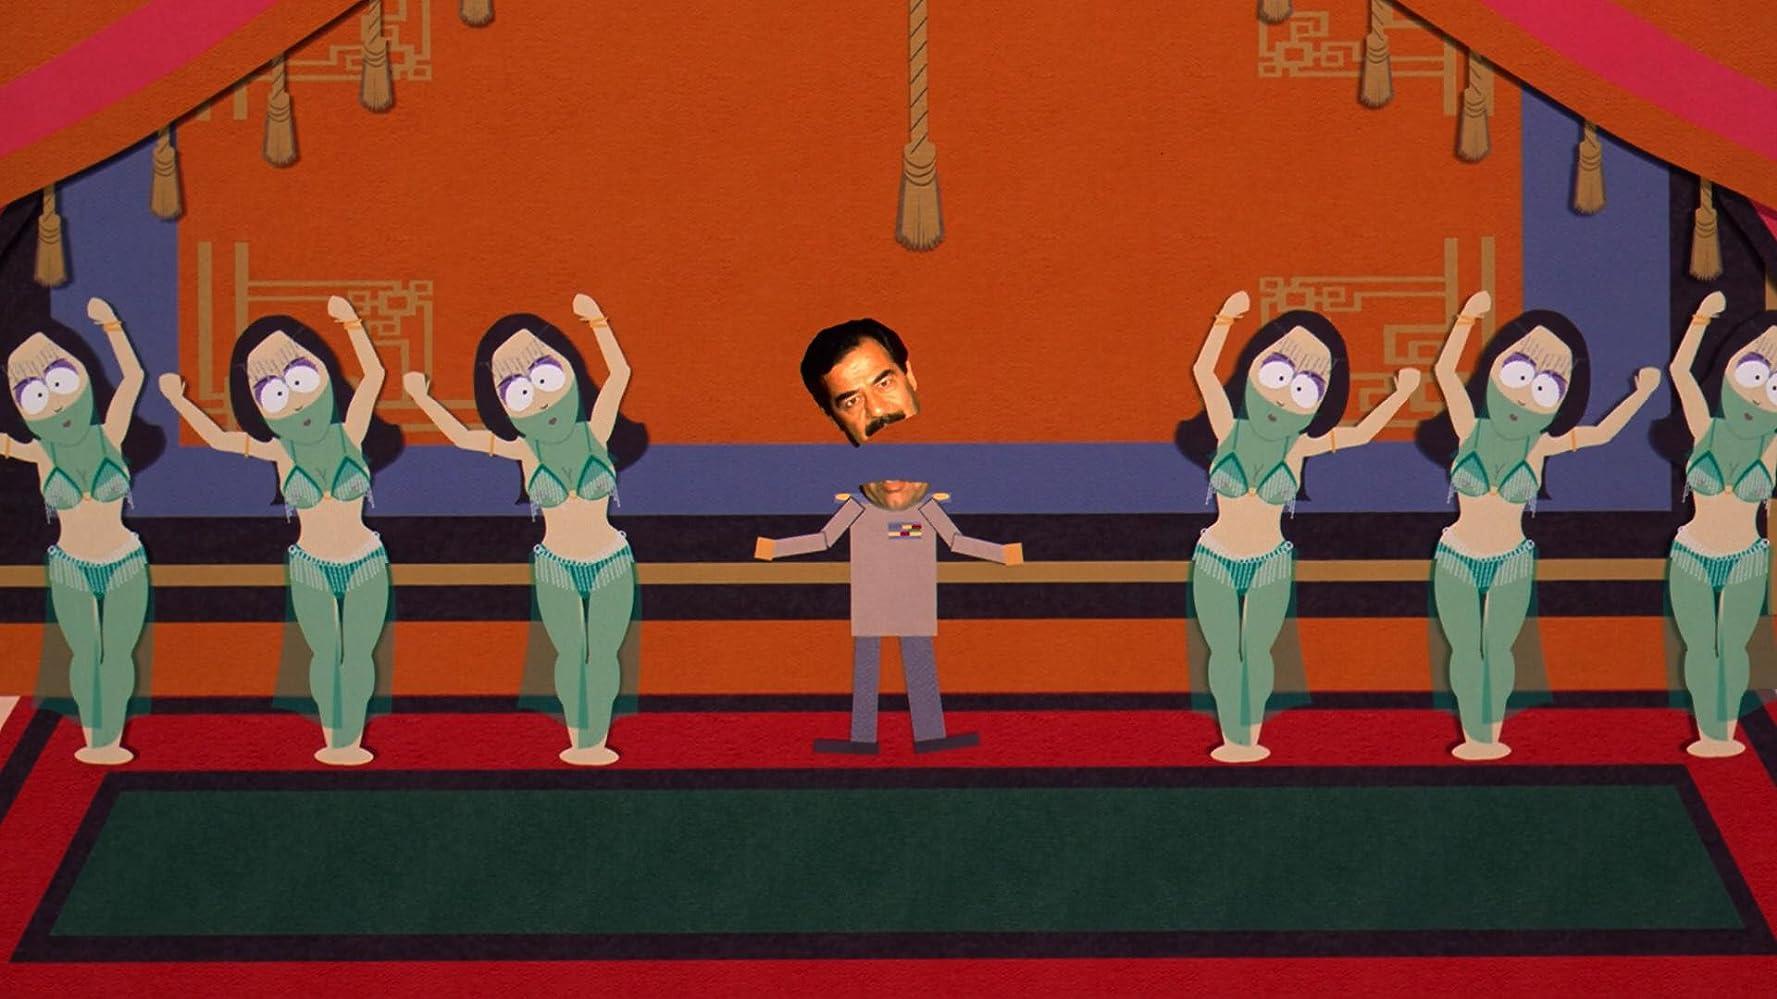 Matt Stone in South Park: Bigger, Longer & Uncut (1999)